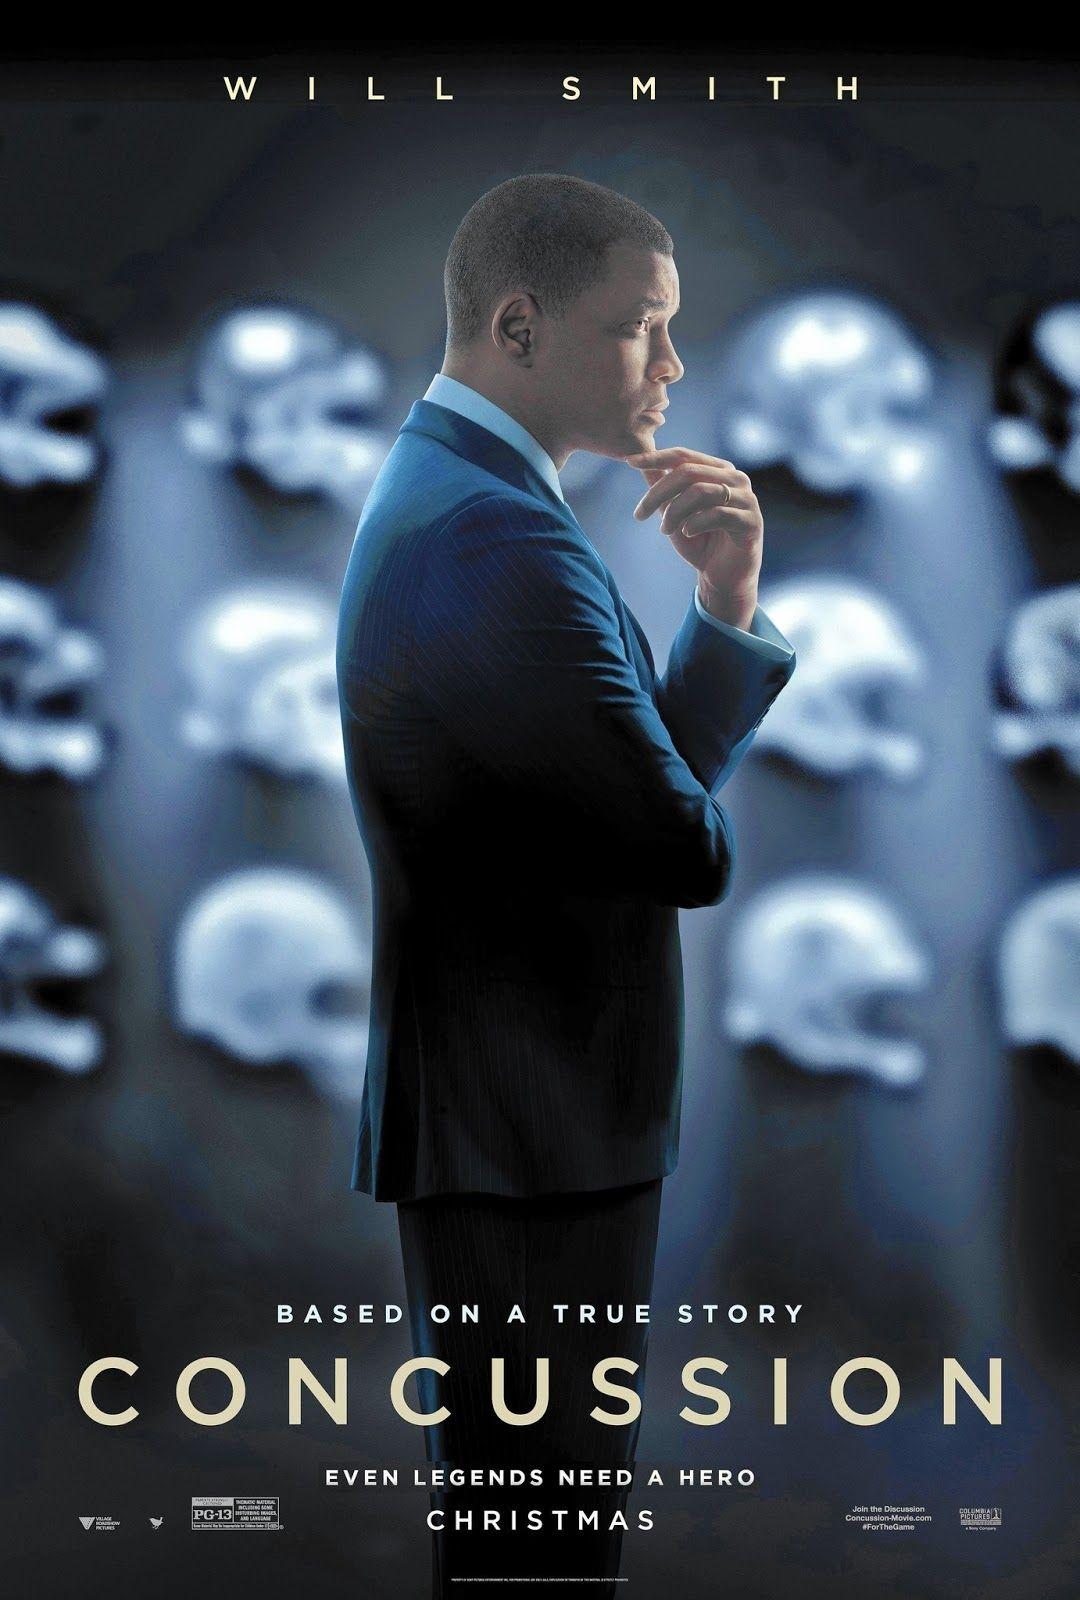 Concussion Quotes Concussion  Movie Zonea  Movie Zone  Pinterest  Movie Films